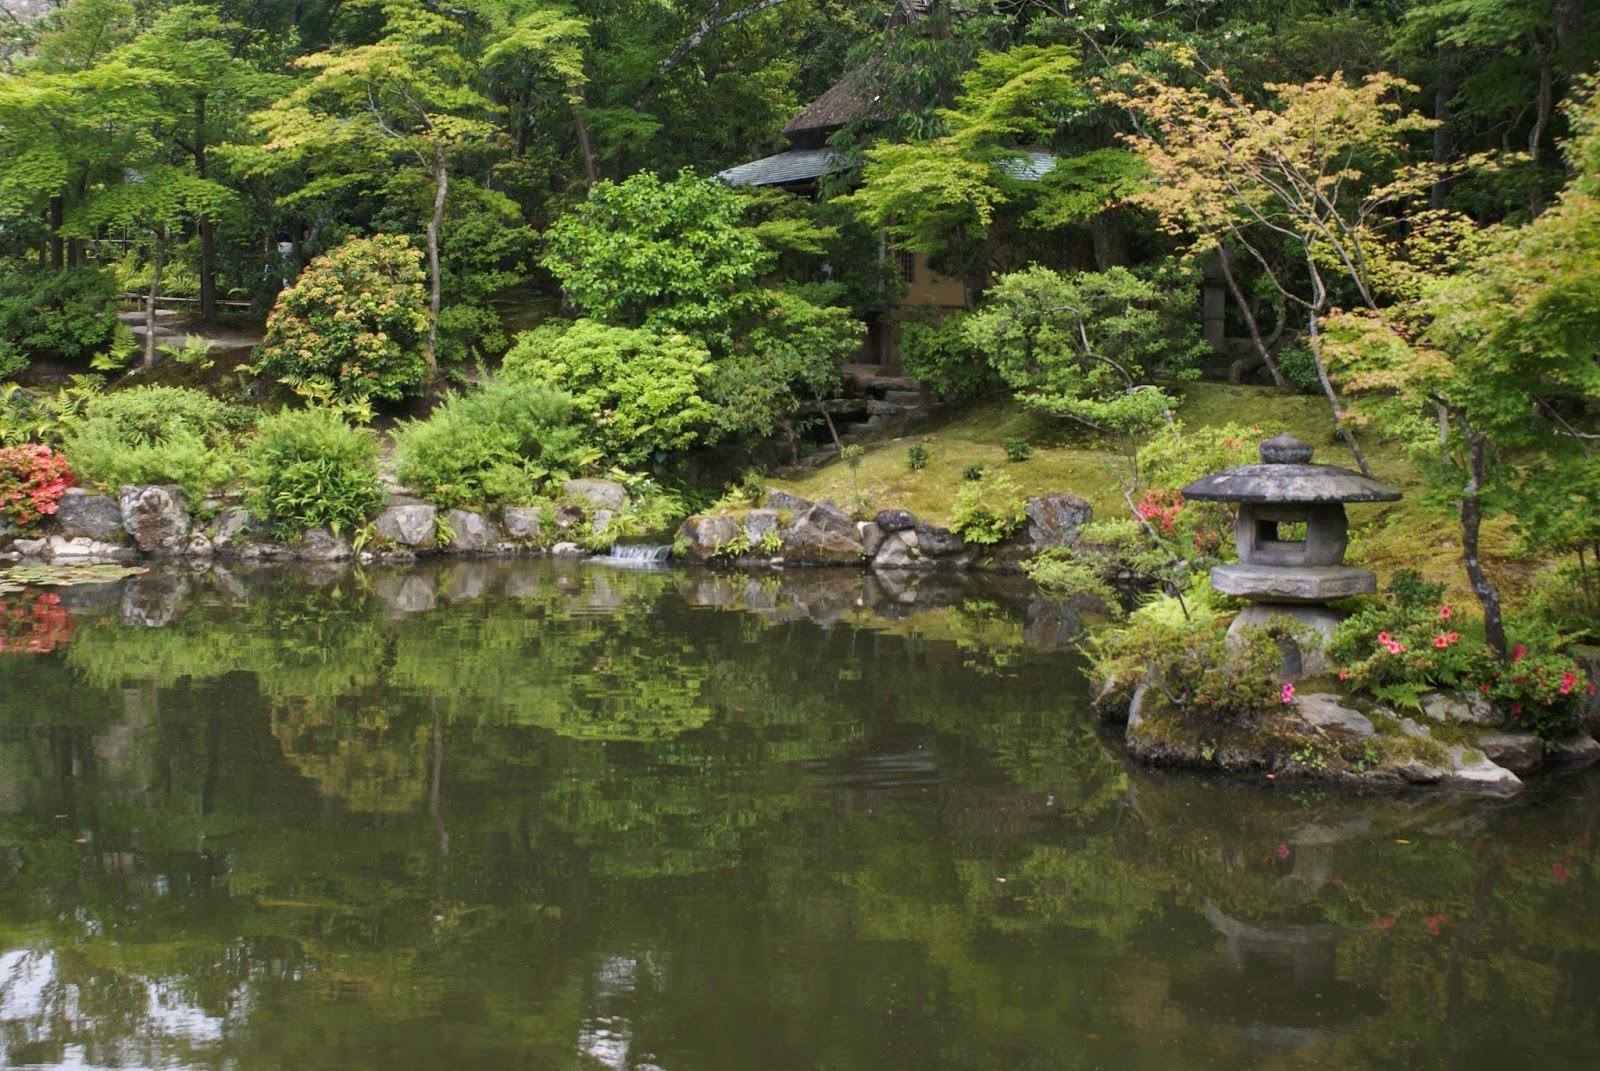 isui-en japon nara jardin